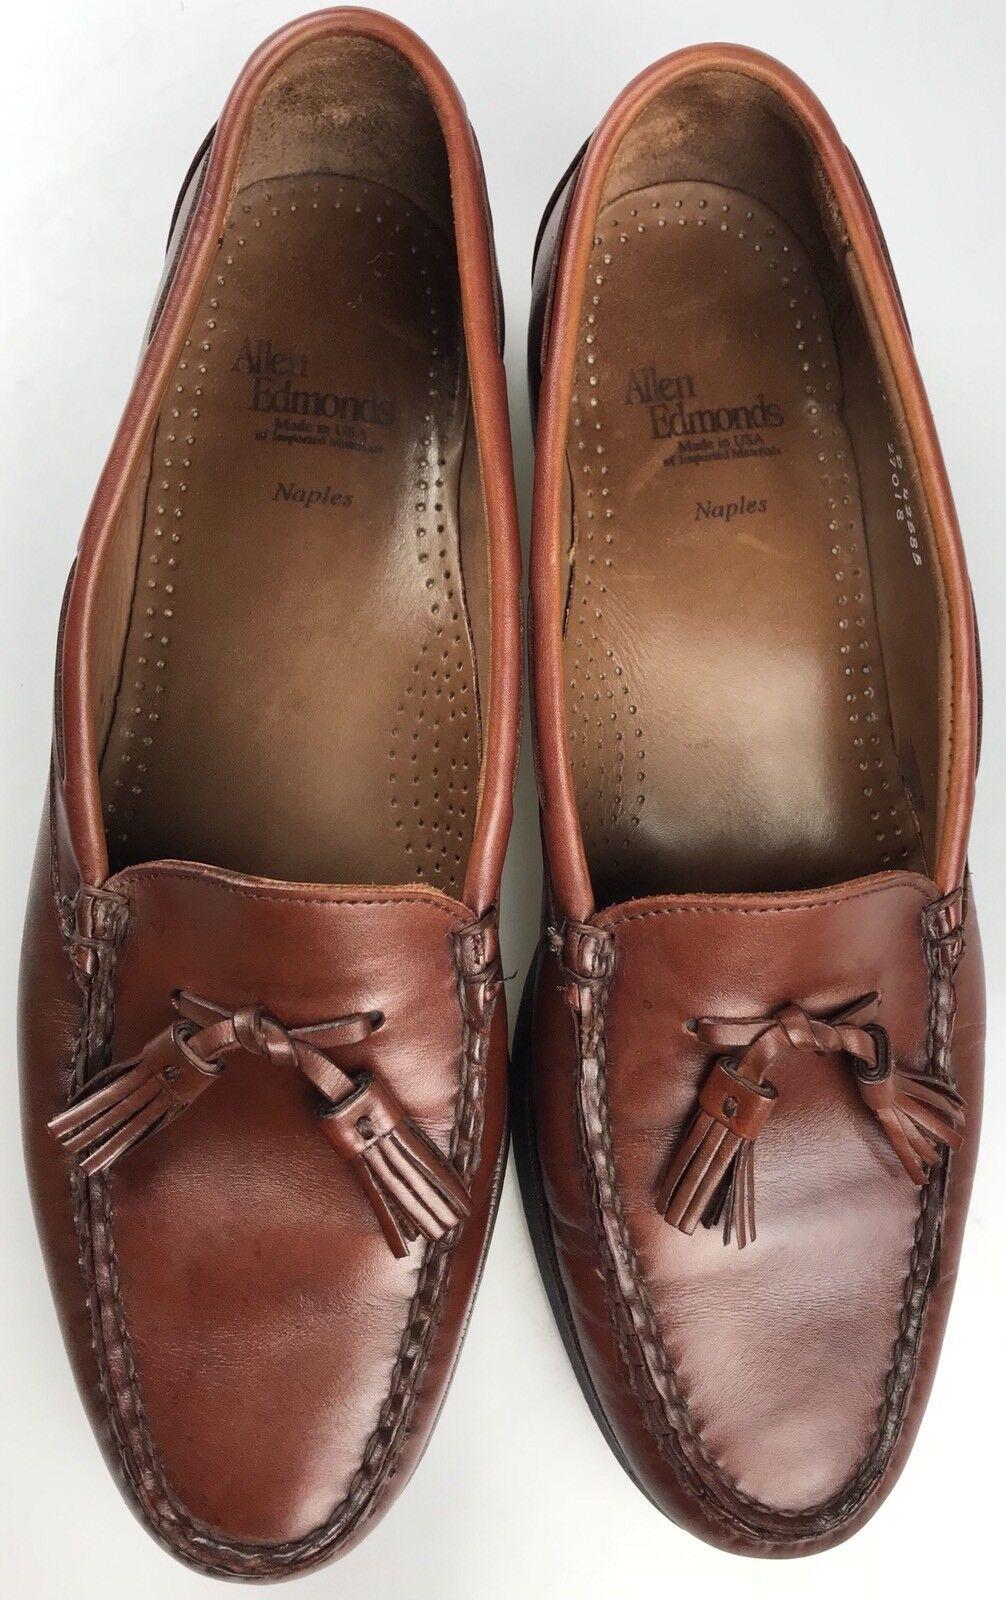 Allen Schuhes Edmonds Naples Chili Braun Tassel Leder Loafer Schuhes Allen Sz 11 D EUC 6bf3a6